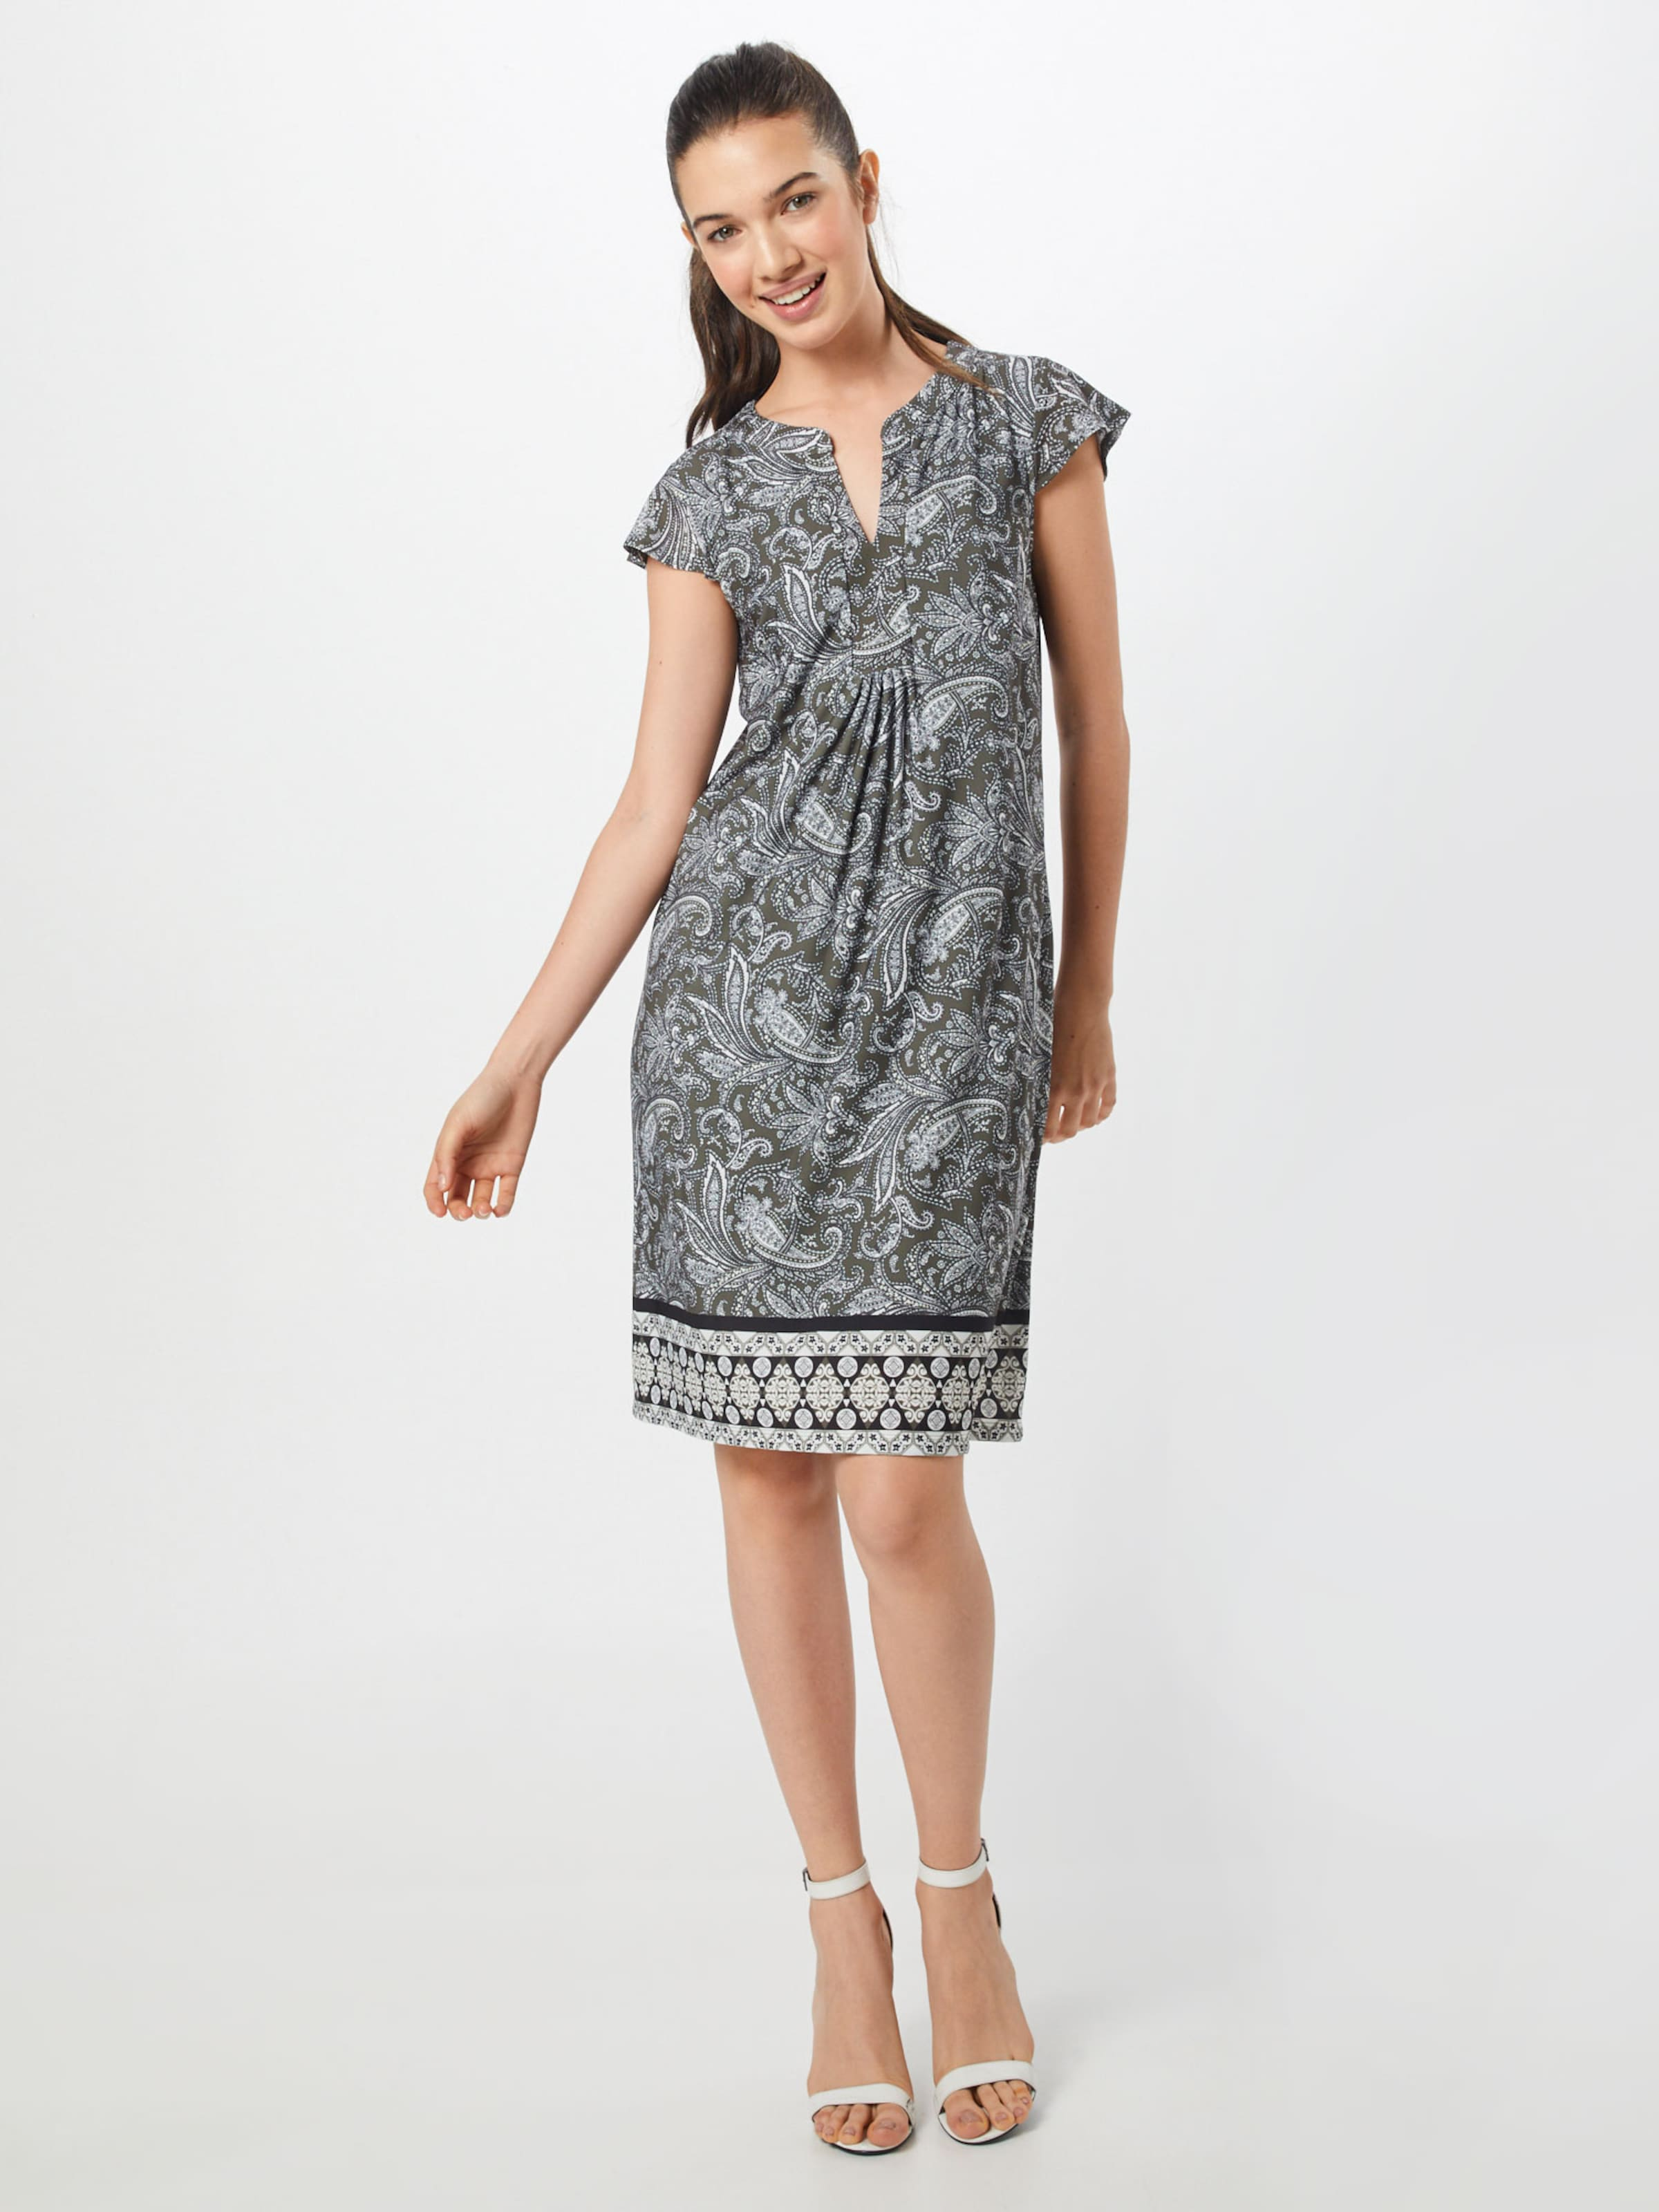 In Moreamp; Kleid Kleid GrauMischfarben Moreamp; In XZiPuk